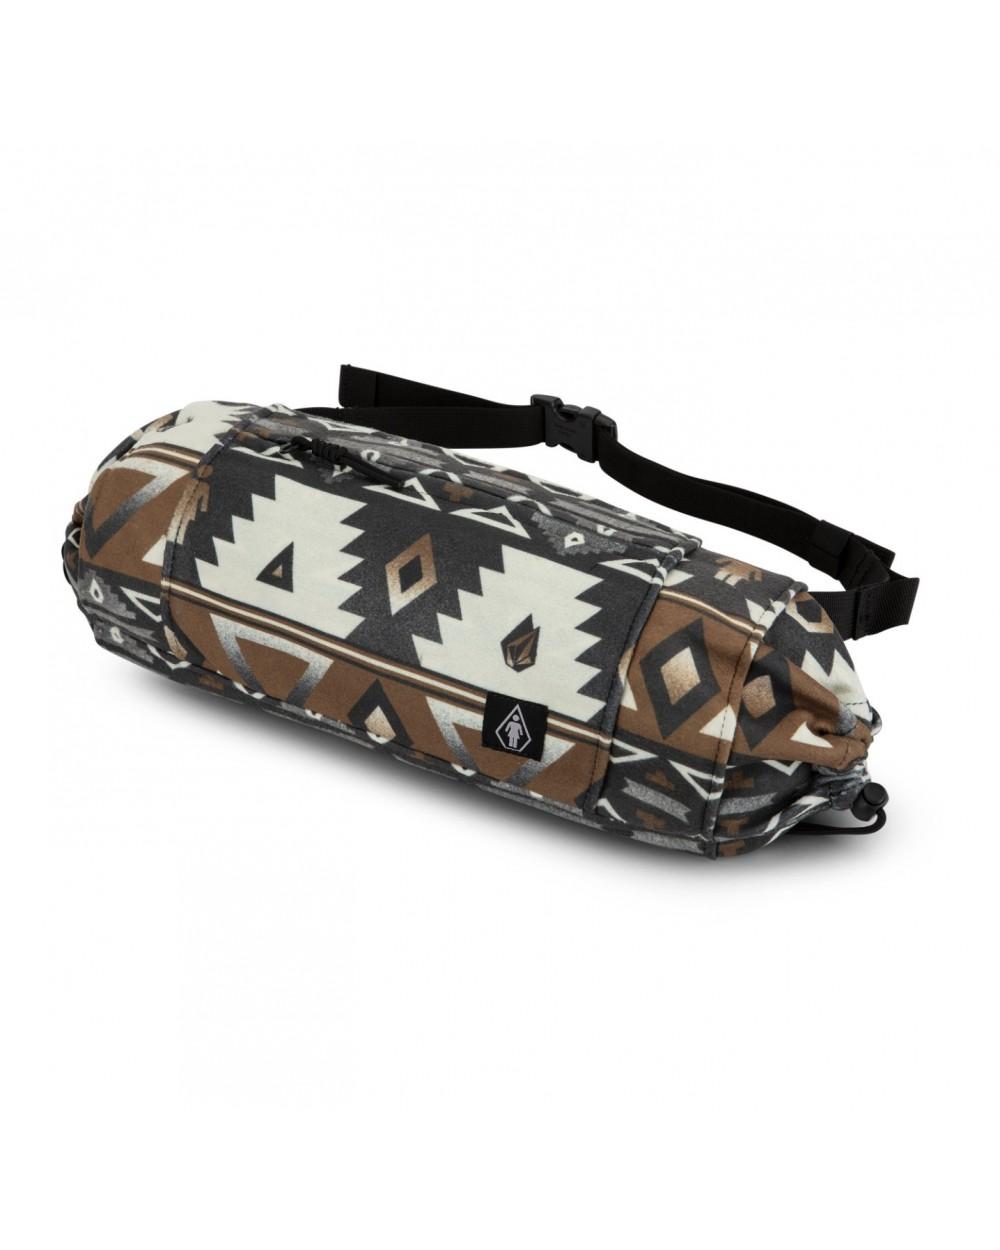 Volcom X Girl Skateboards Bag - LImited Edition - Sand